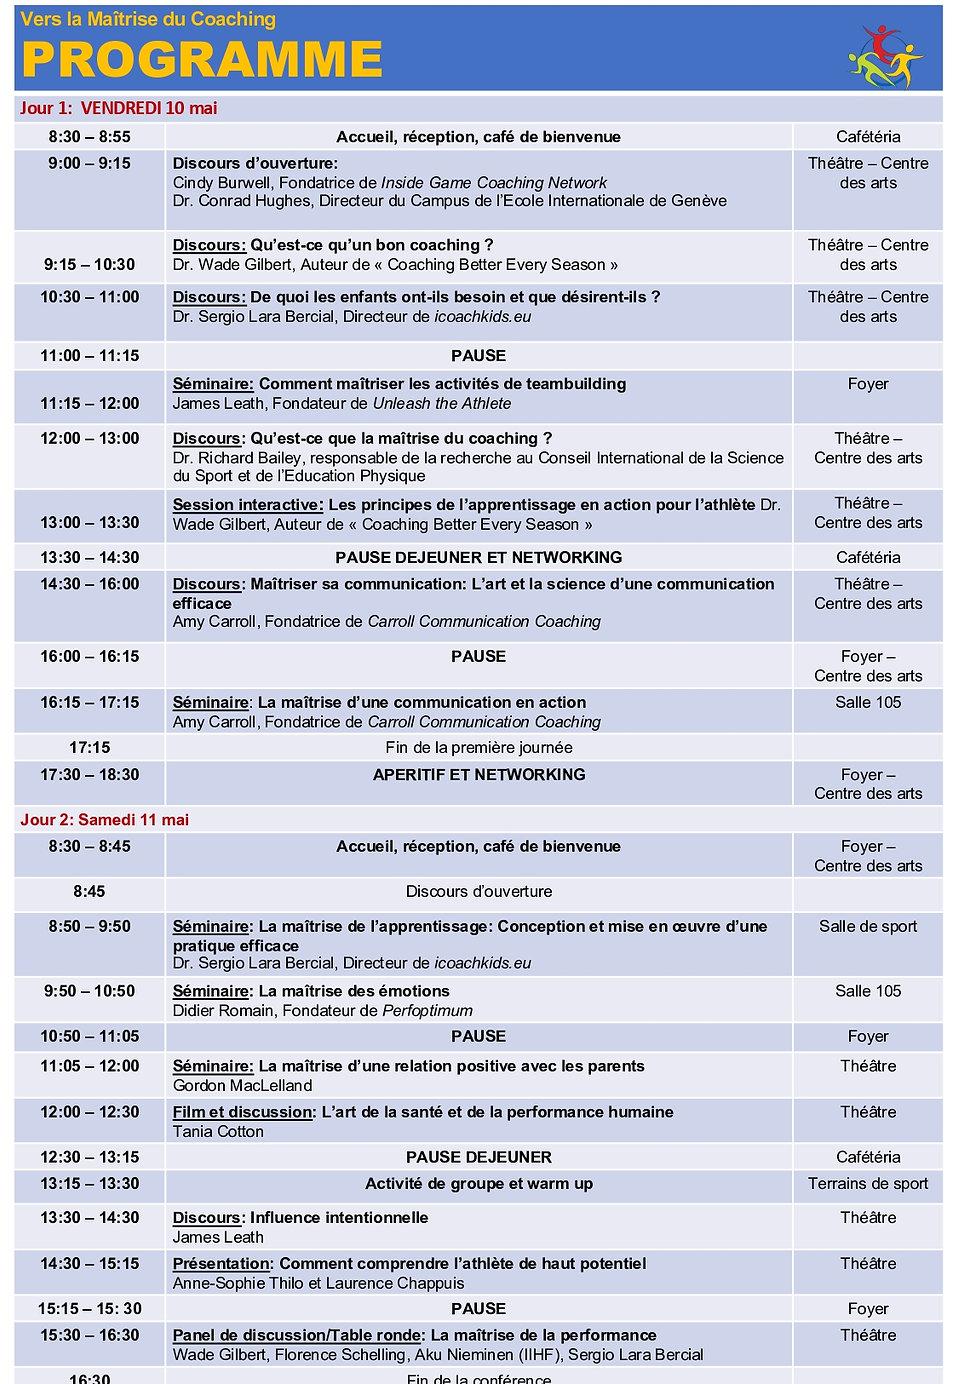 2019 Programme (FR)_page-0001.jpg